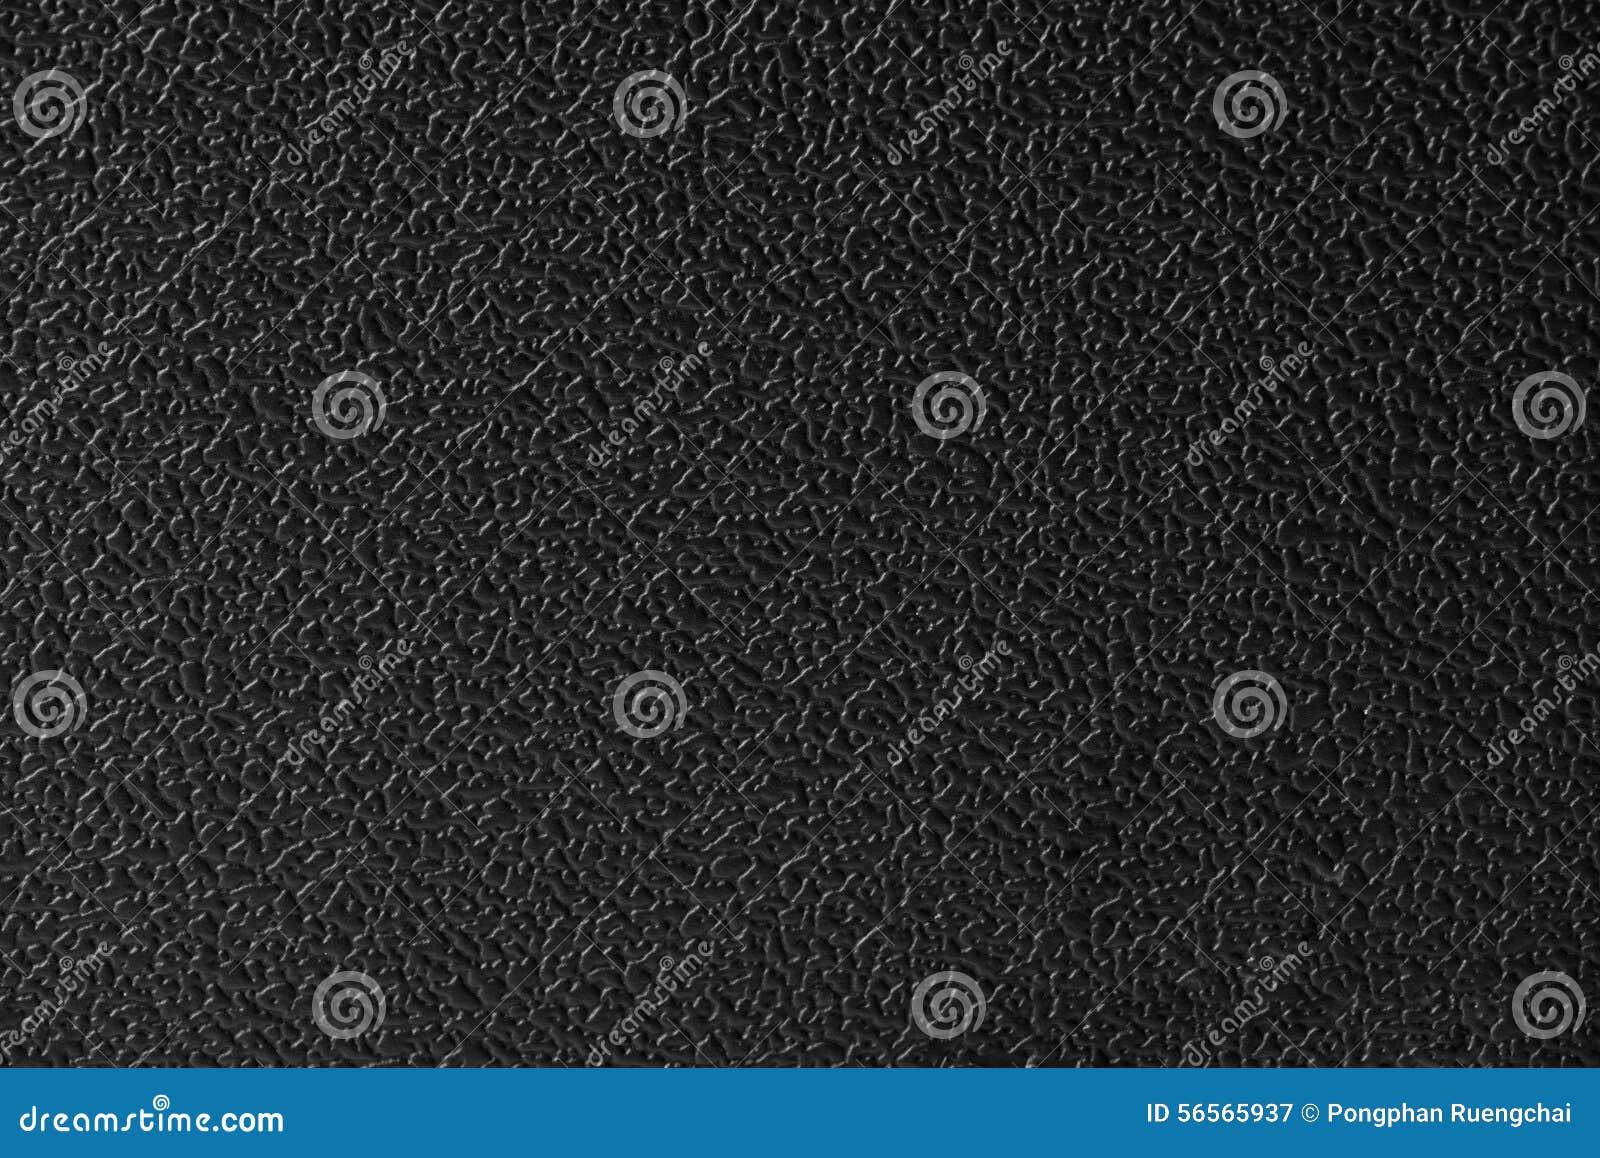 Download μαύρη σύσταση leatherette στοκ εικόνα. εικόνα από μακροεντολή - 56565937